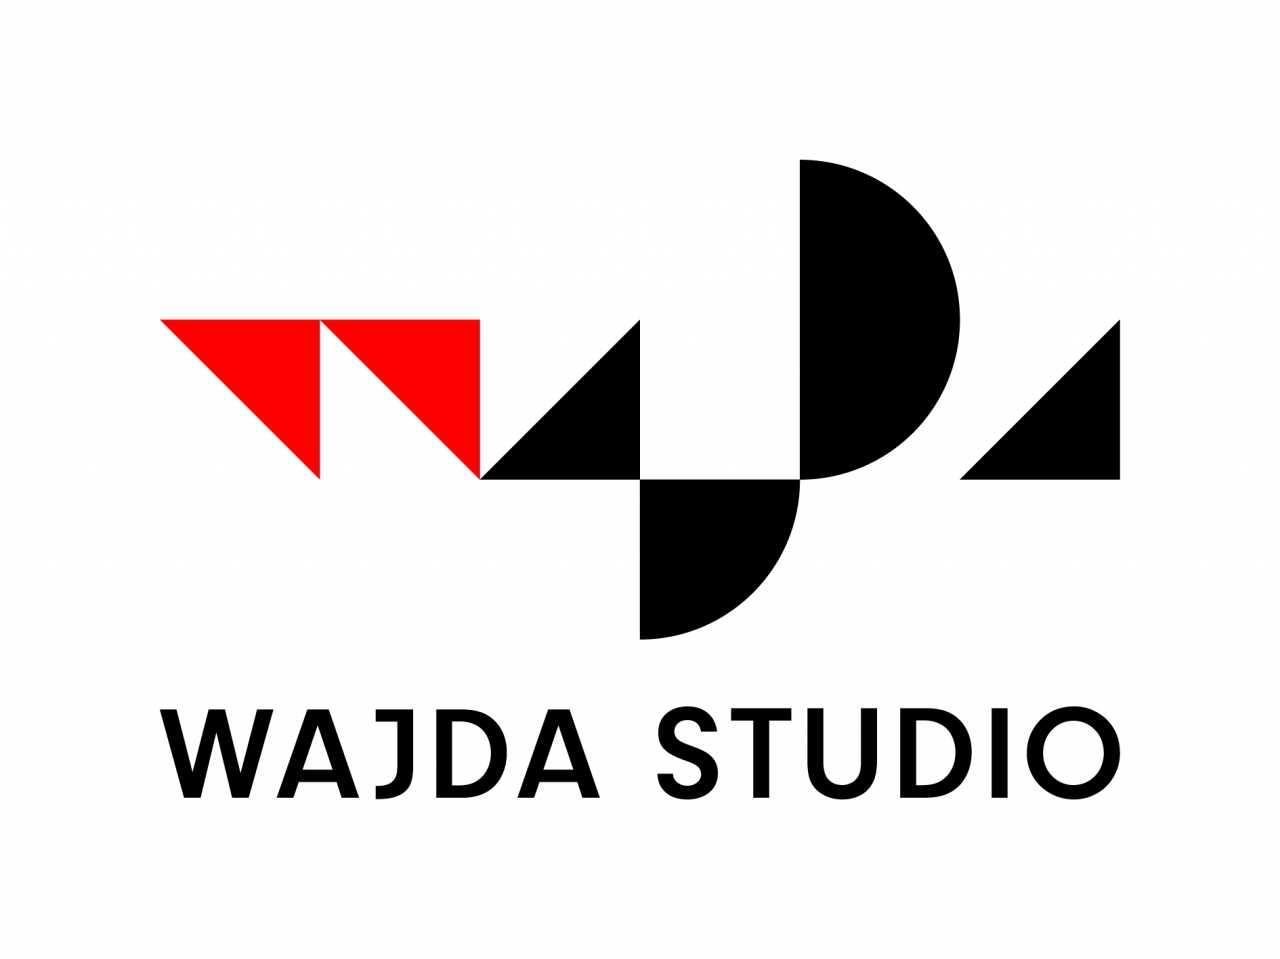 Wajda Studio